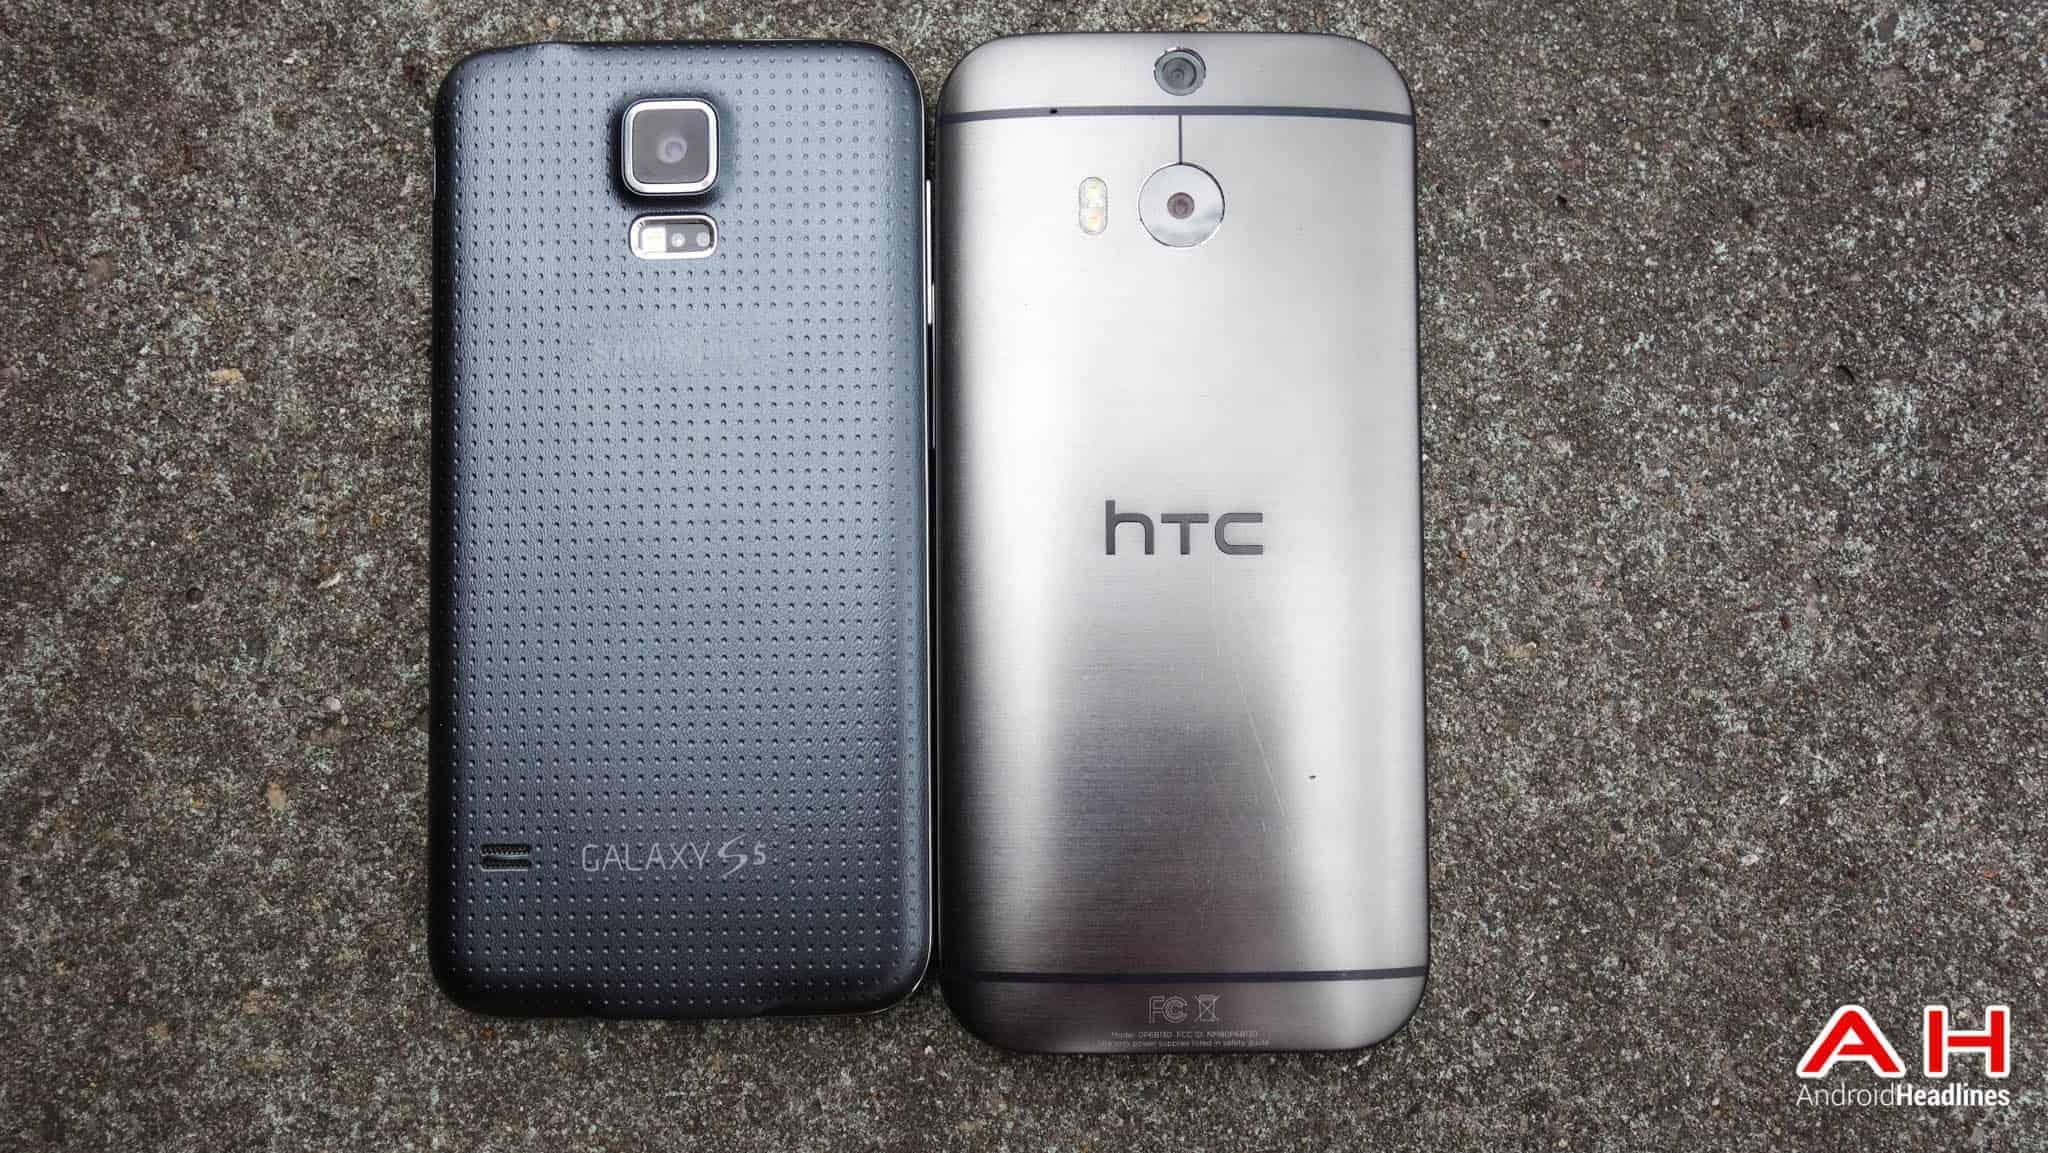 Samsung-Galaxy-S5-vs-HTC-One-M8-AH-9